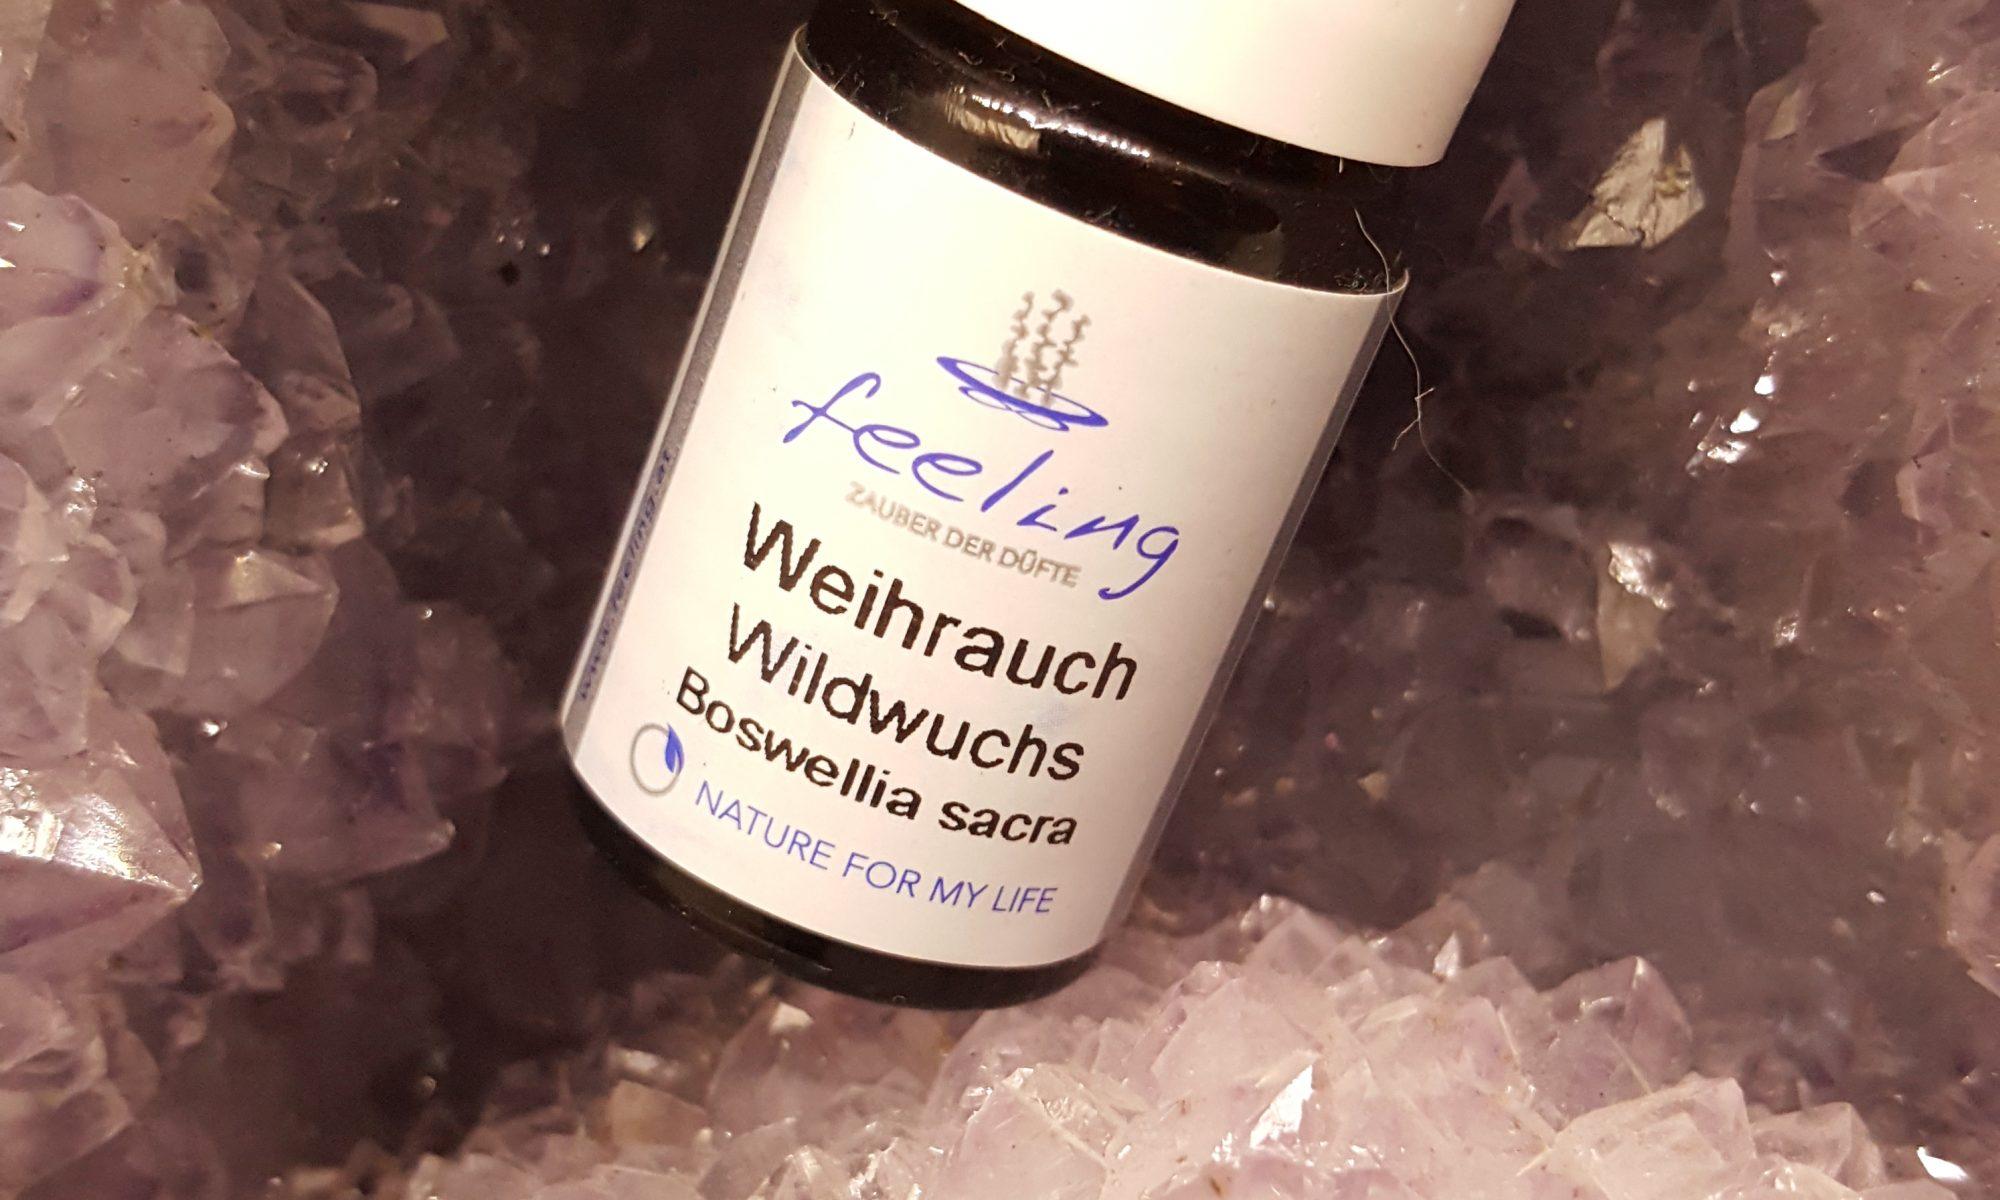 Weihrauch Wildwuchs (Boswellia sacra)